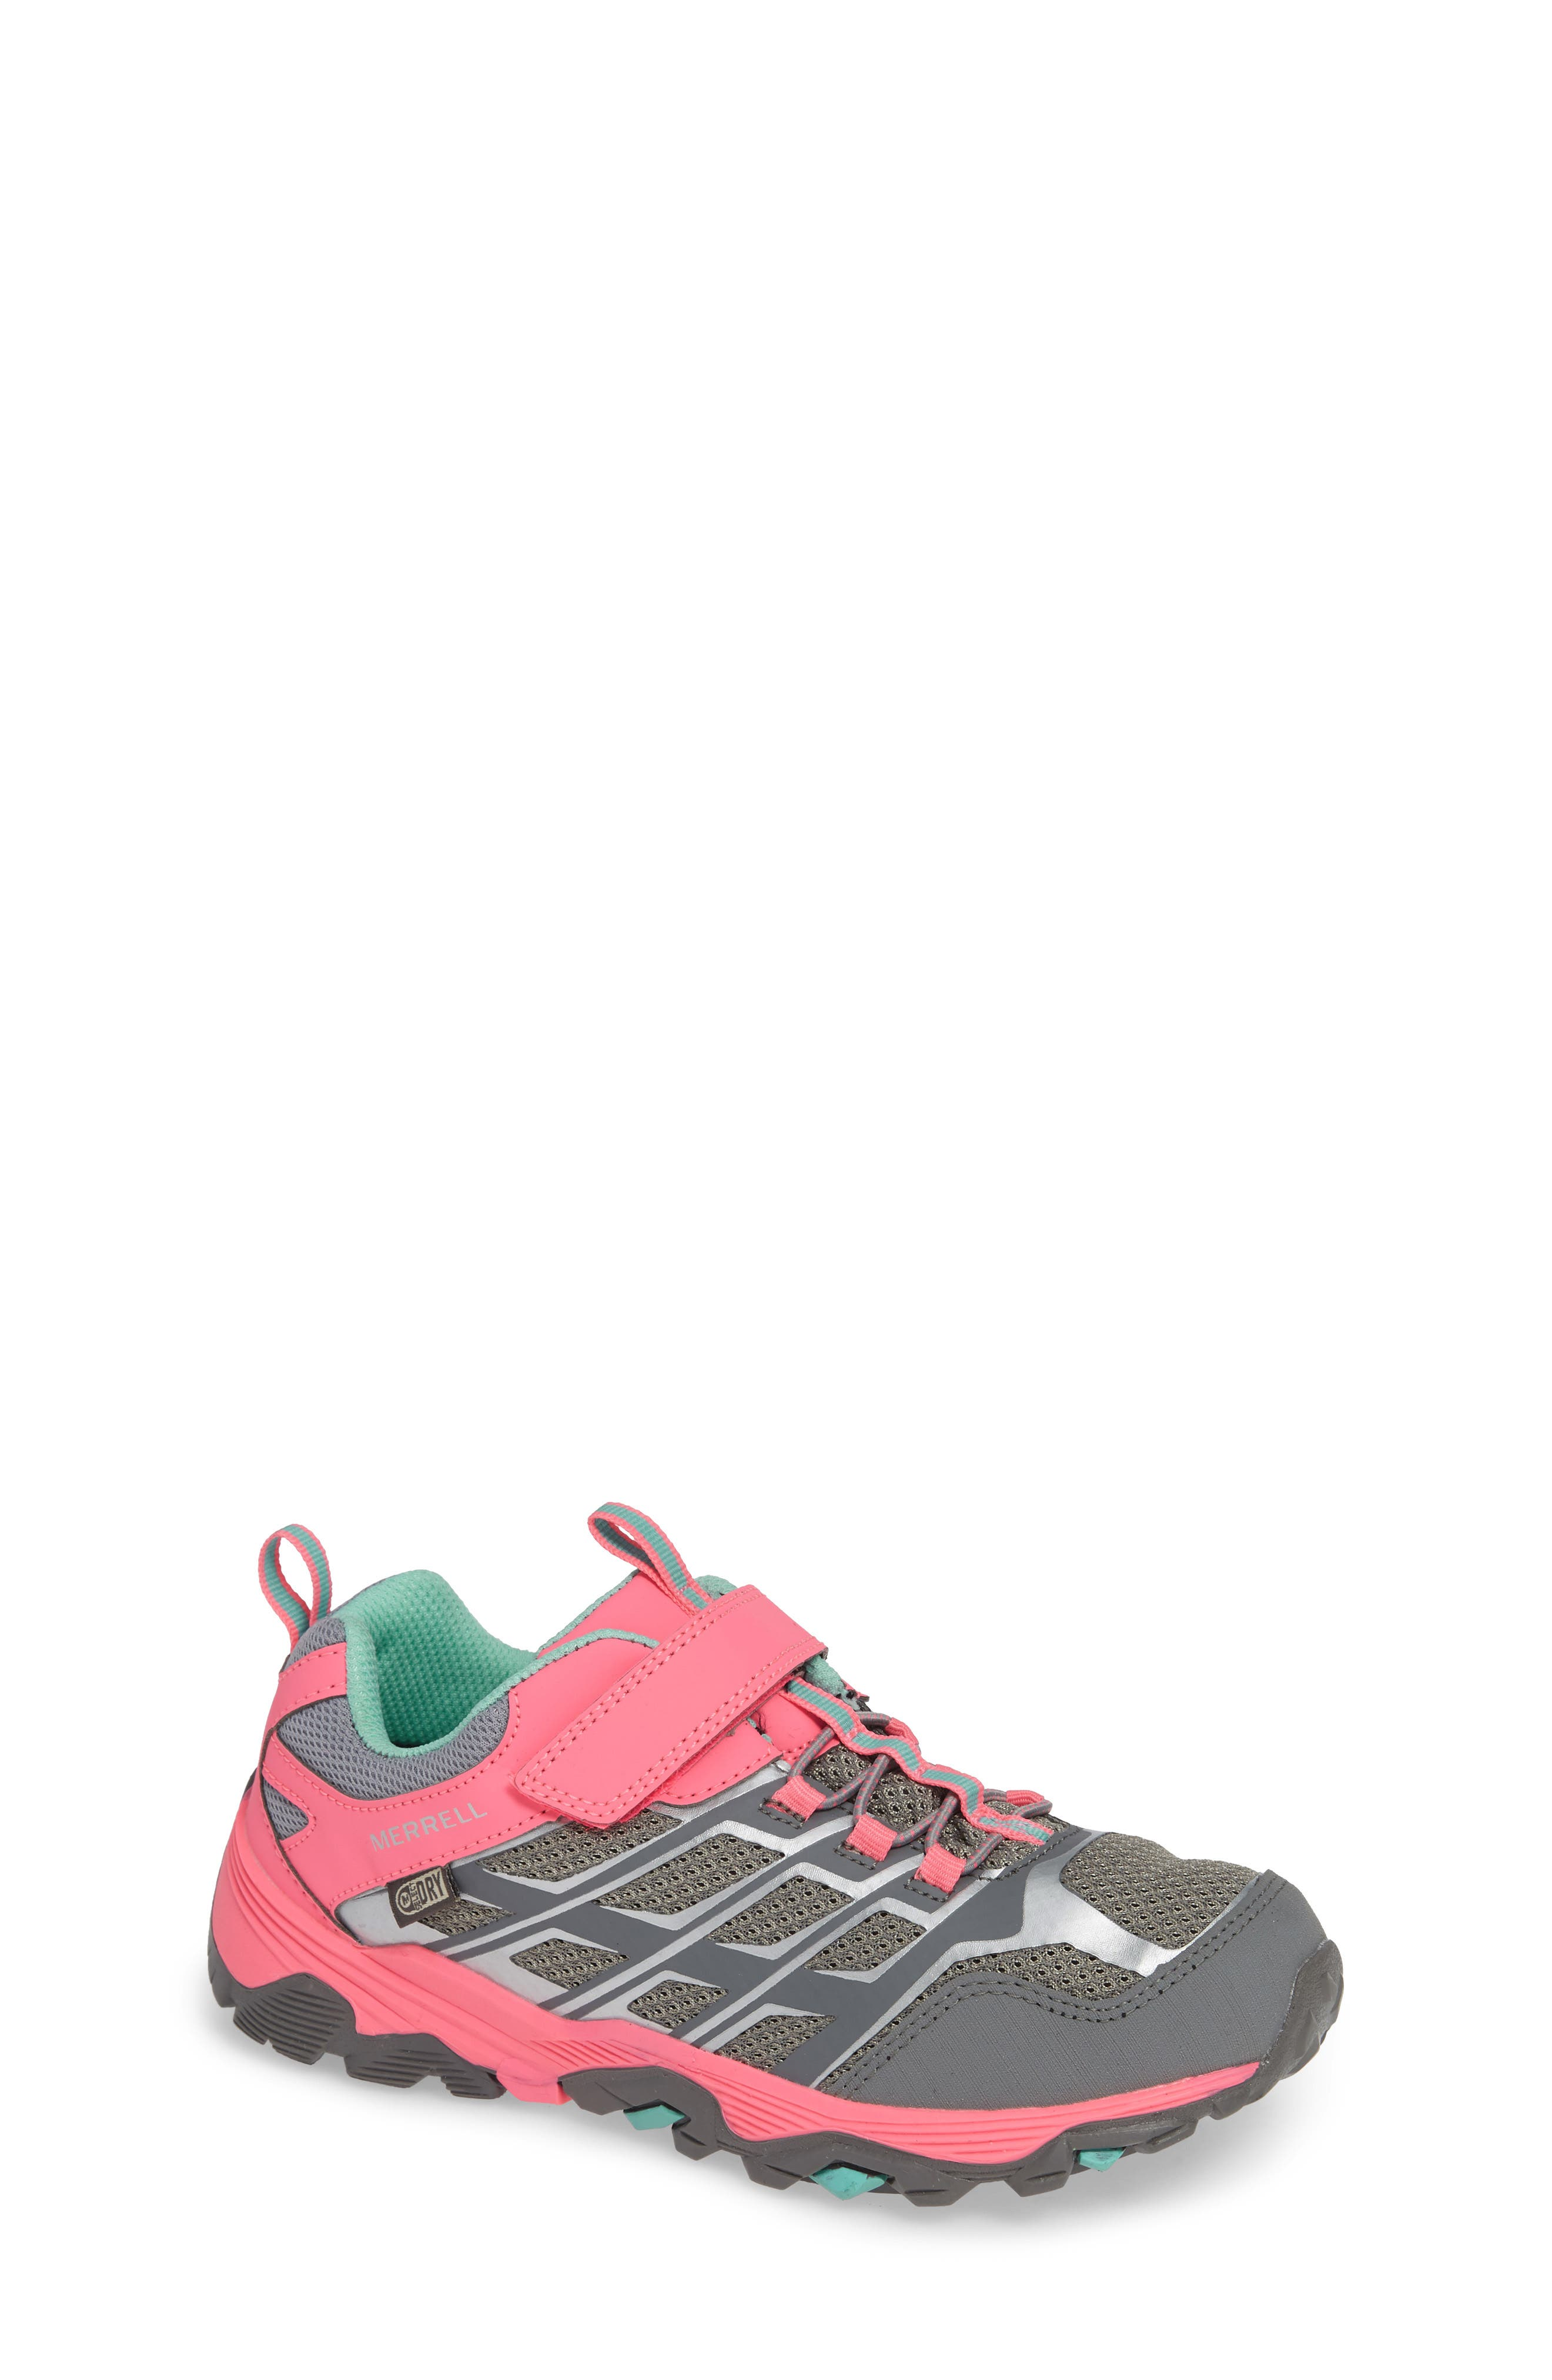 MERRELL, Moab FST Polar Low Waterproof Sneaker, Main thumbnail 1, color, GREY/ CORAL